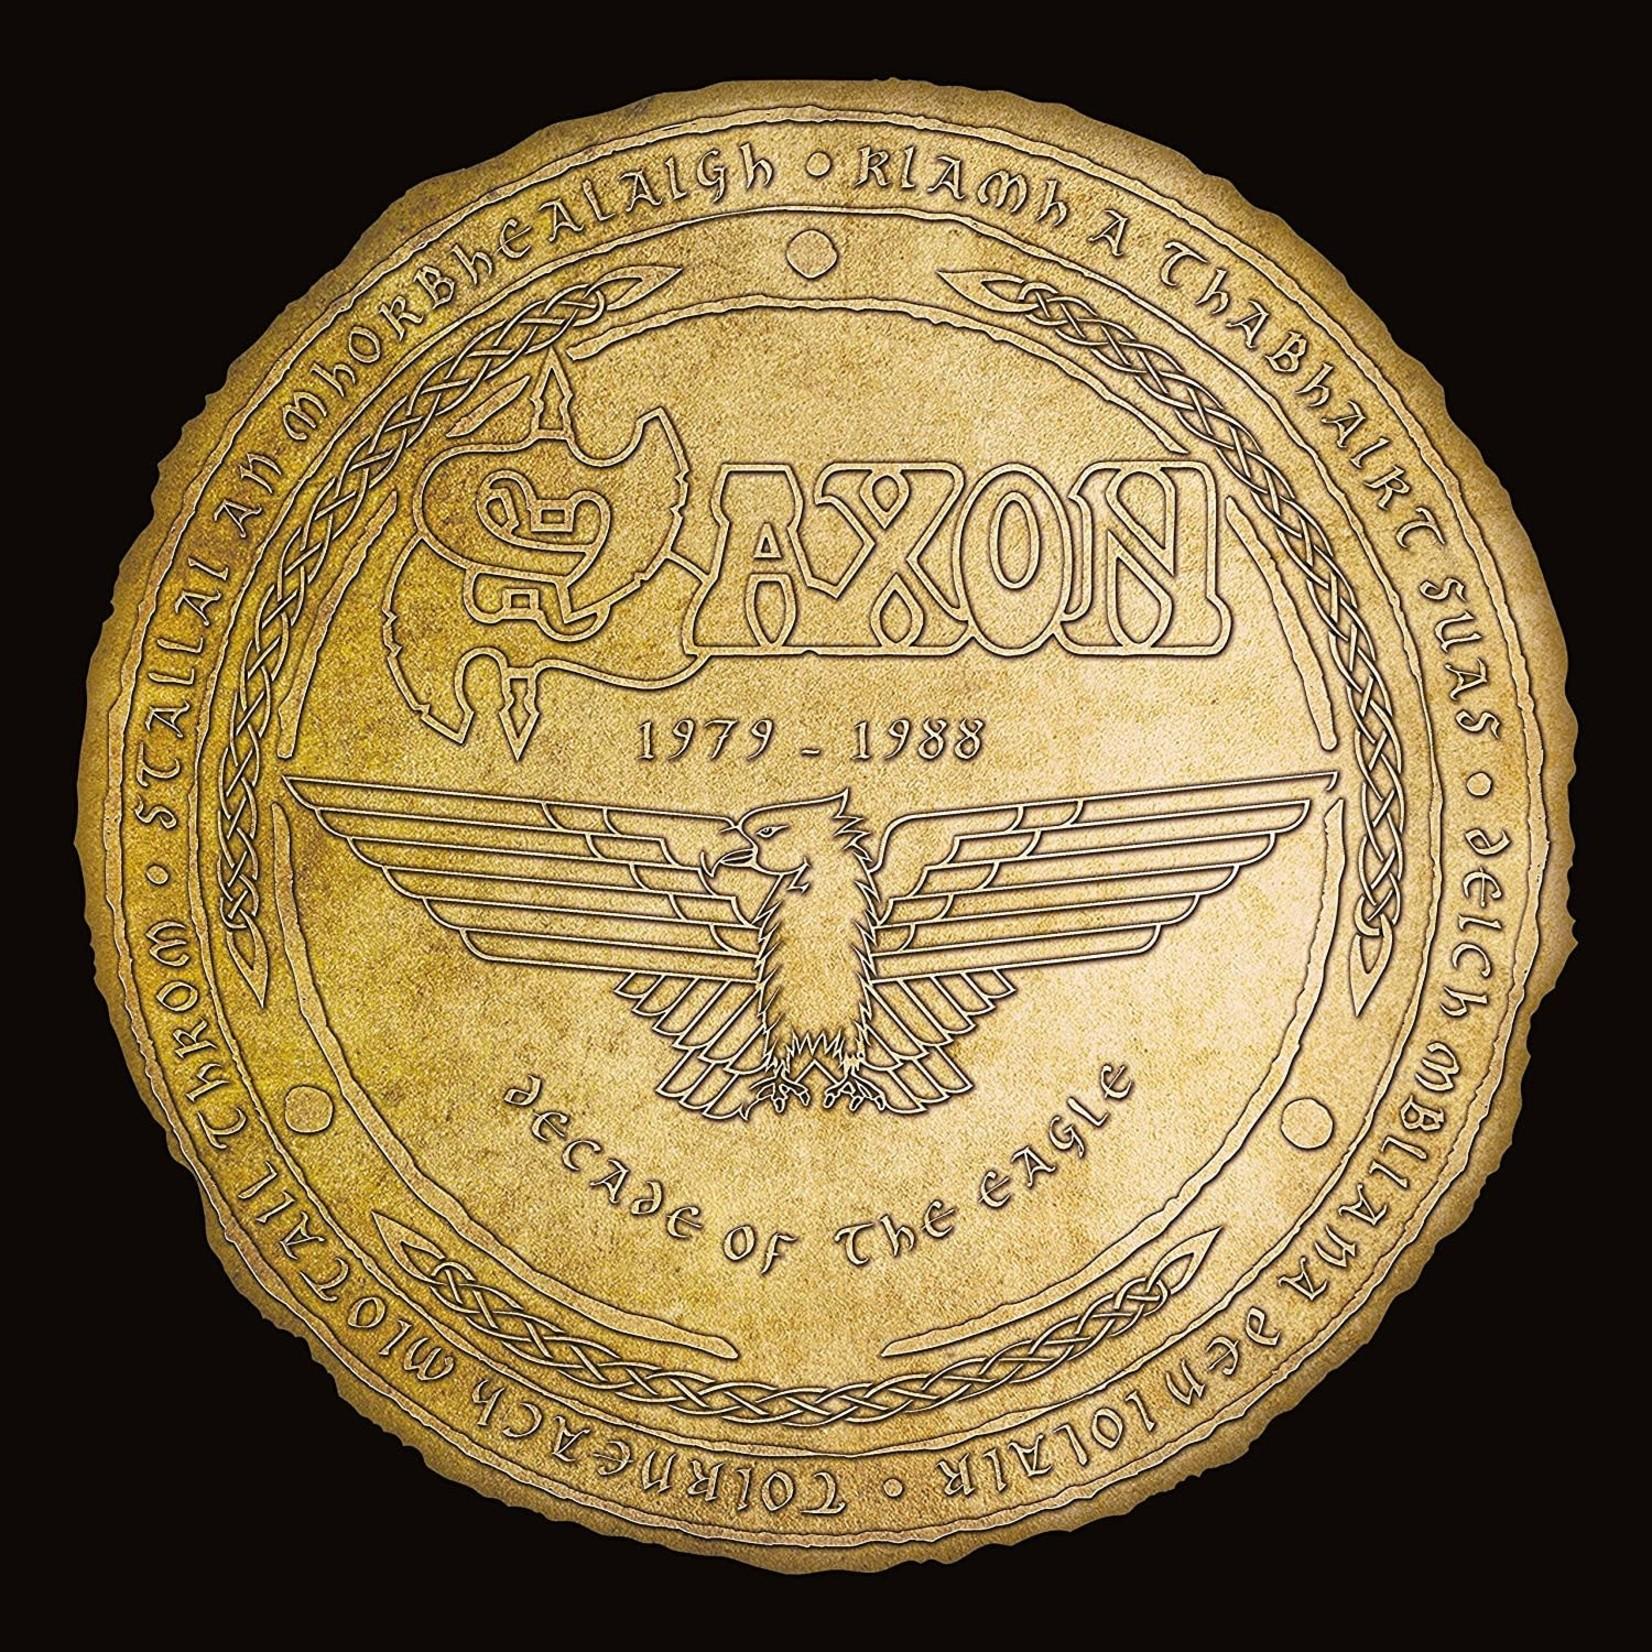 SAXON DECADE OF THE EAGLE 1979 - 1988